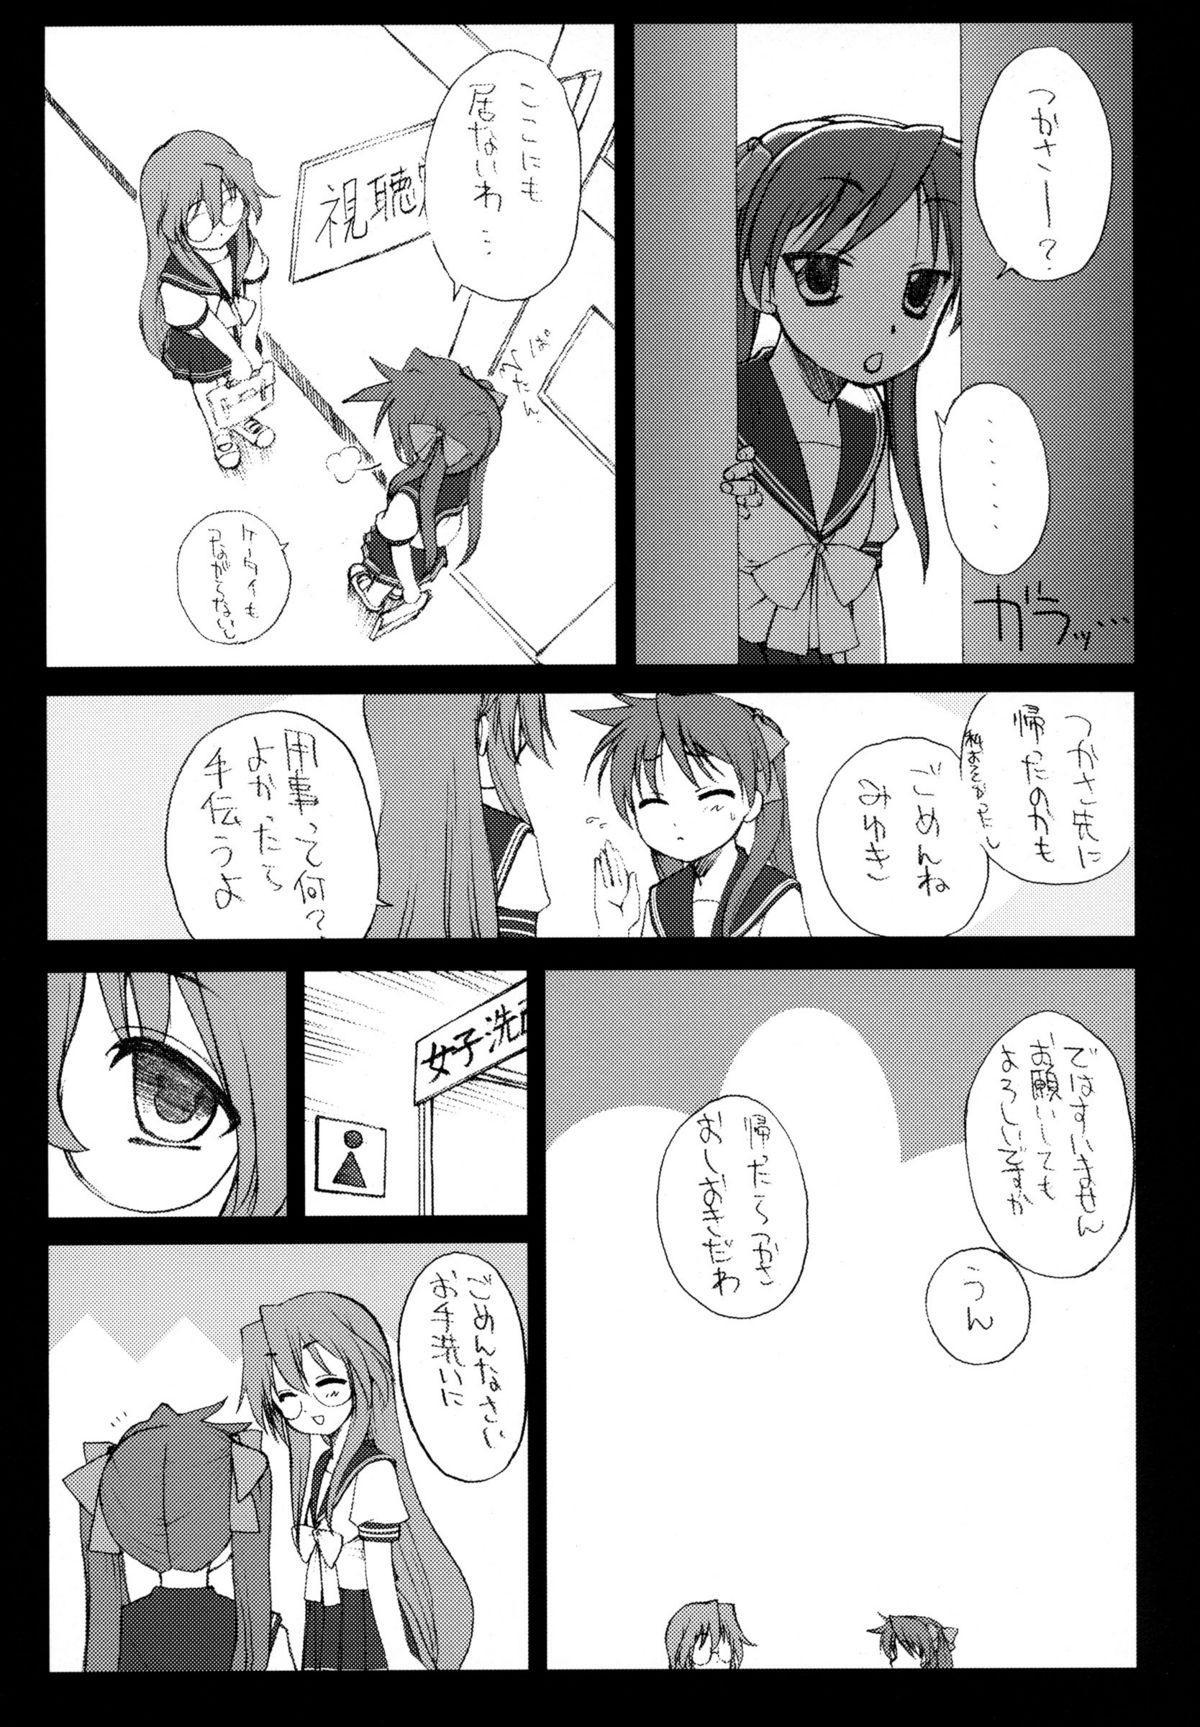 JEWELBOX DECADENT-GRAY Kyuukyousha no Toilet Kagami Tsukasa no Ecchi na Hon 6